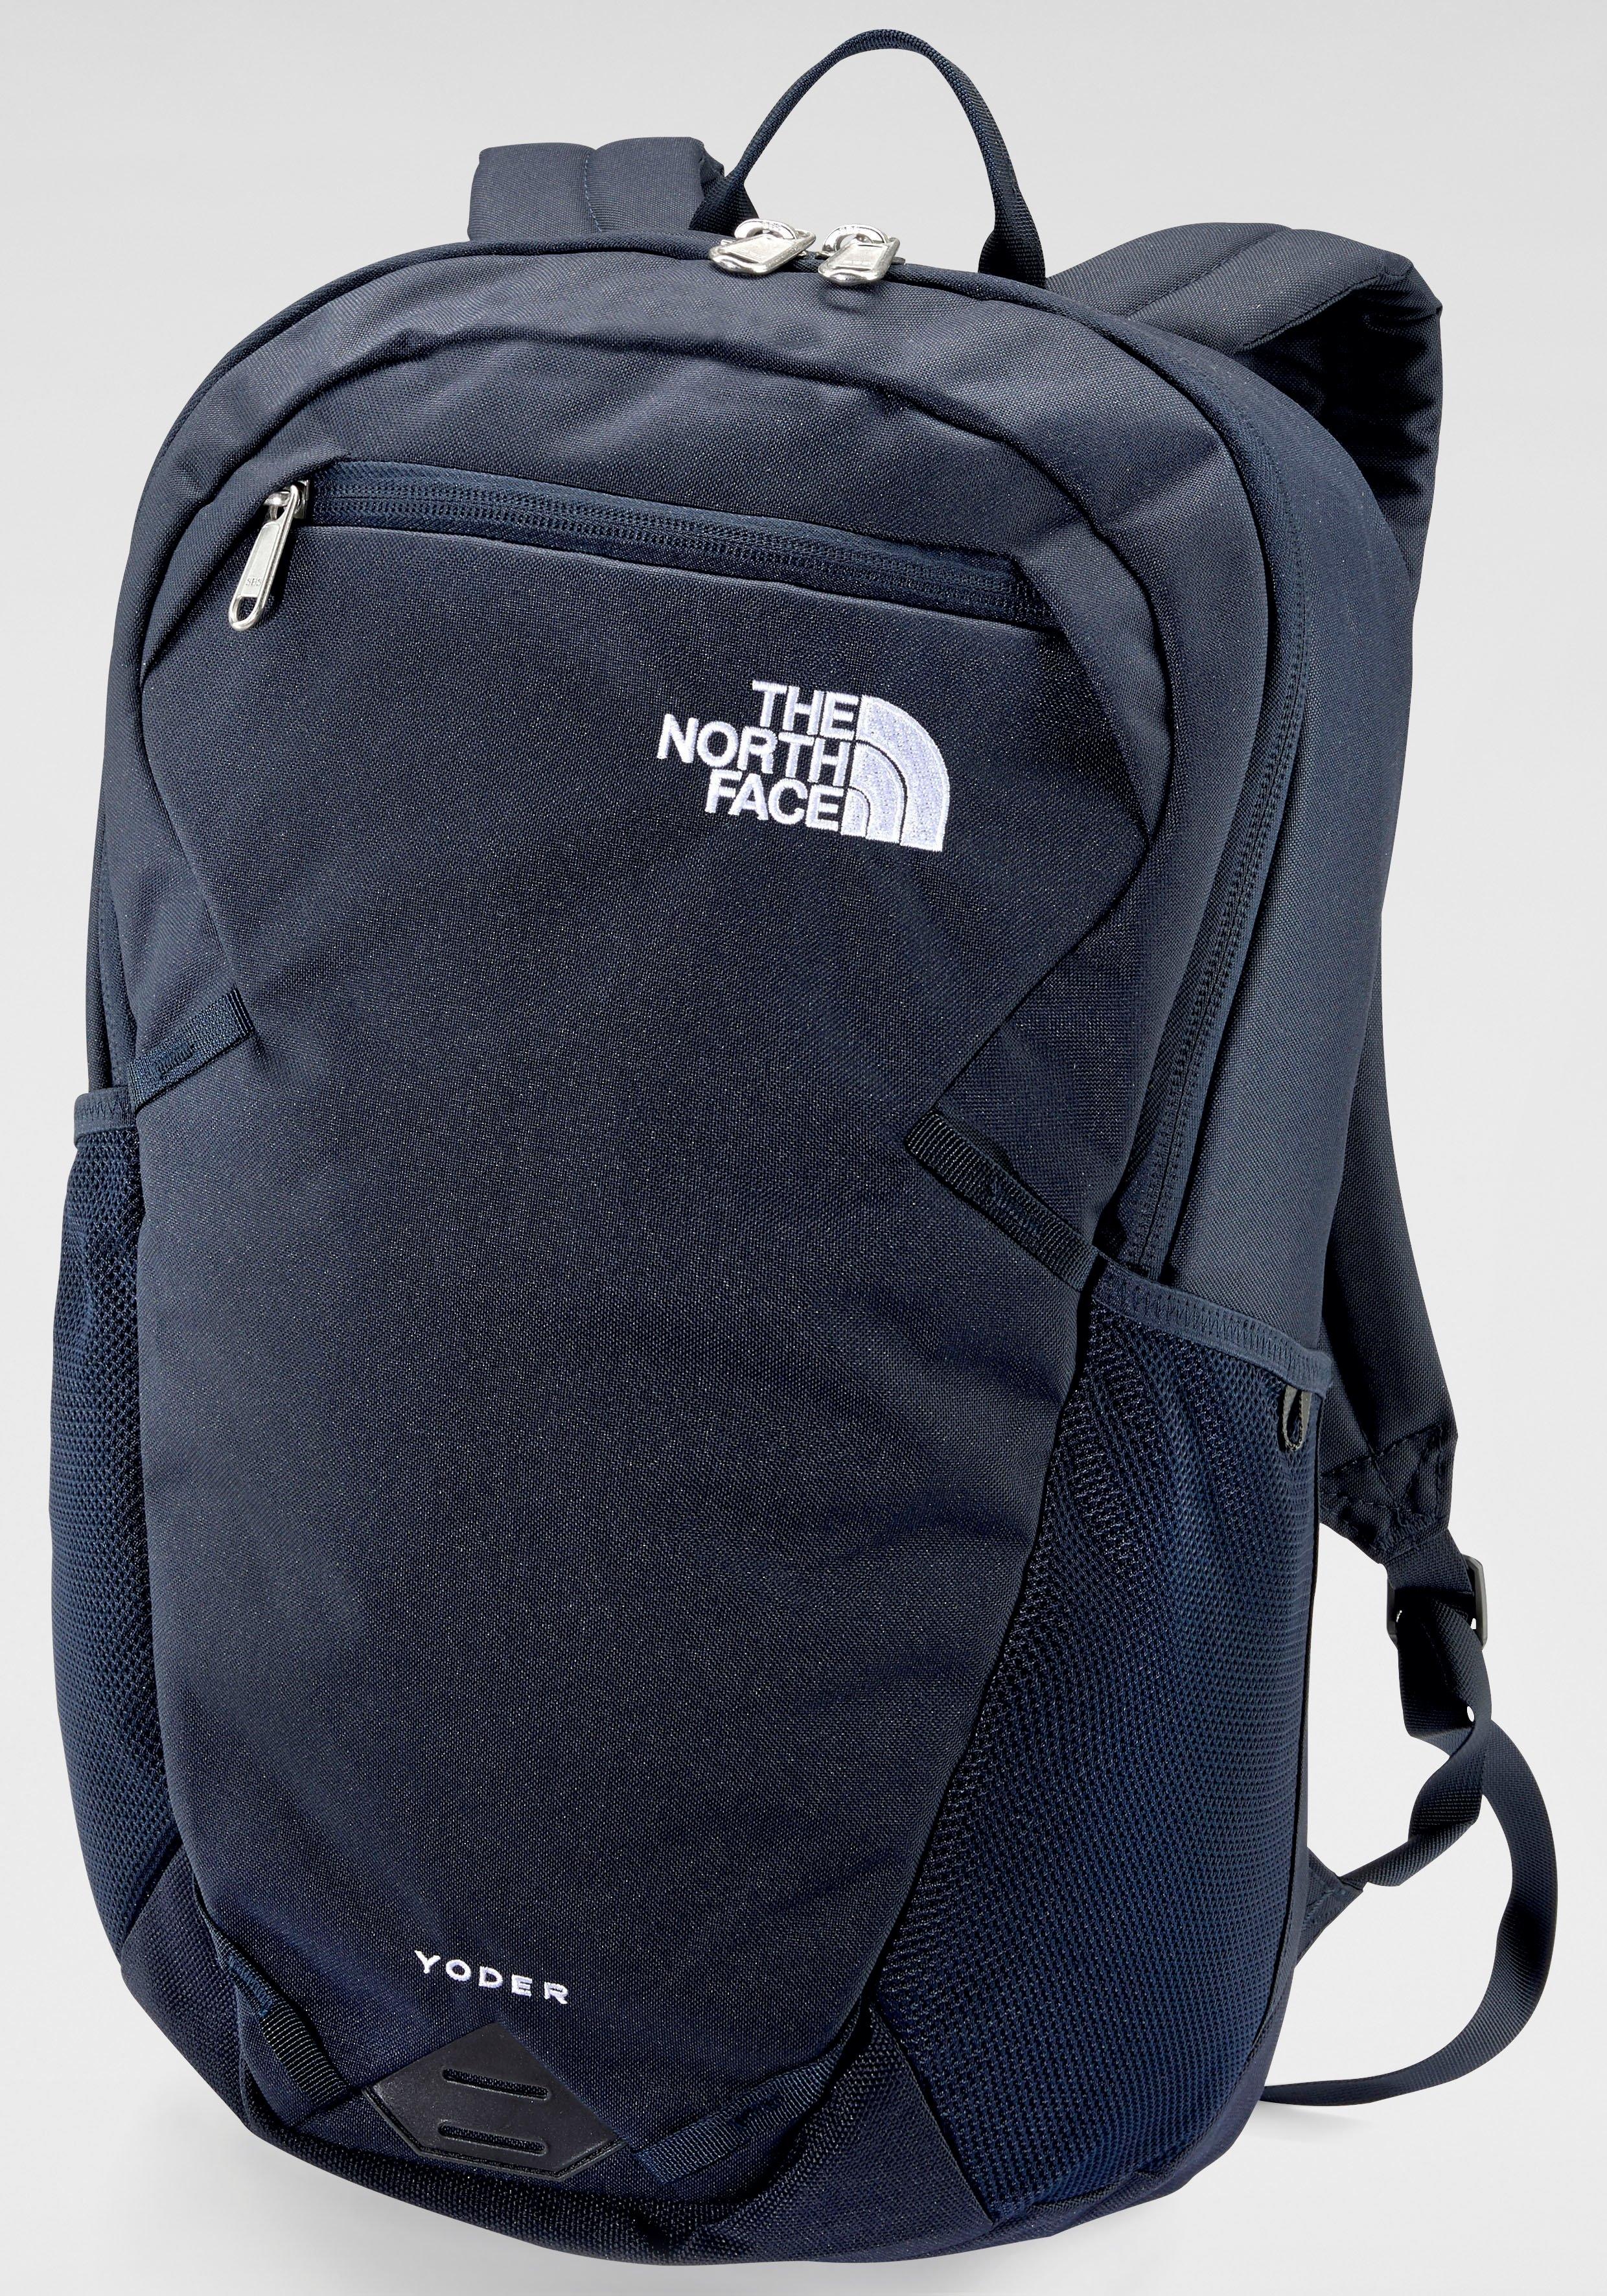 The North Face rugzak YODER voordelig en veilig online kopen